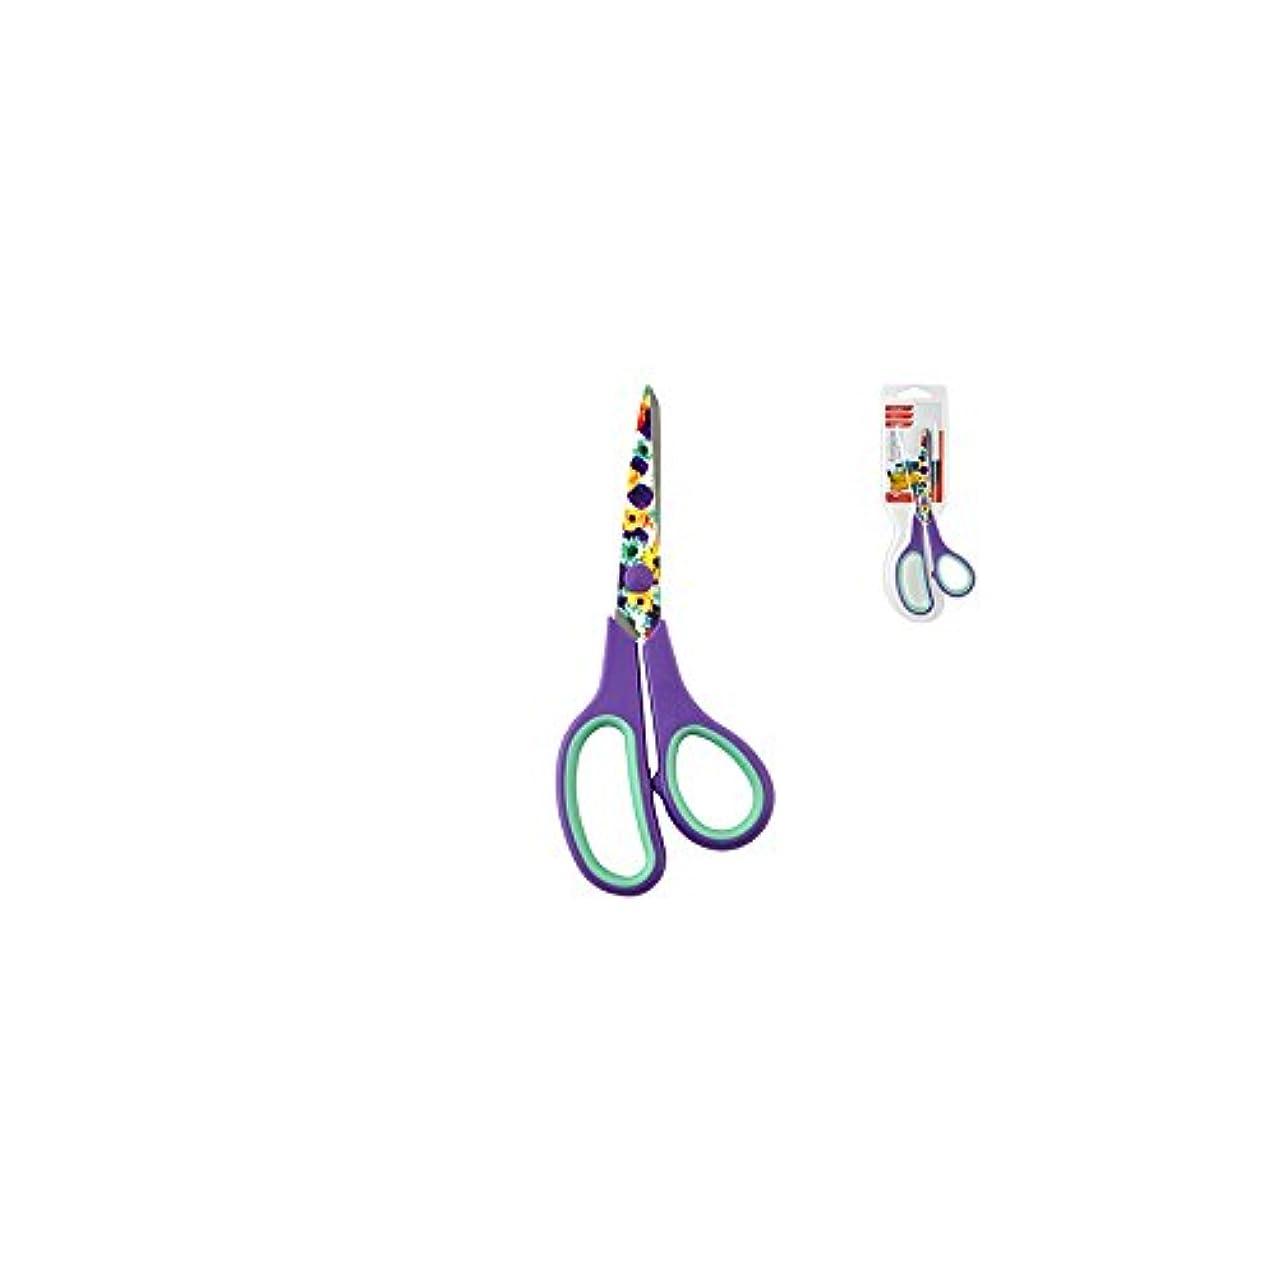 Home Scissor with Decorated, Blade 19?cm